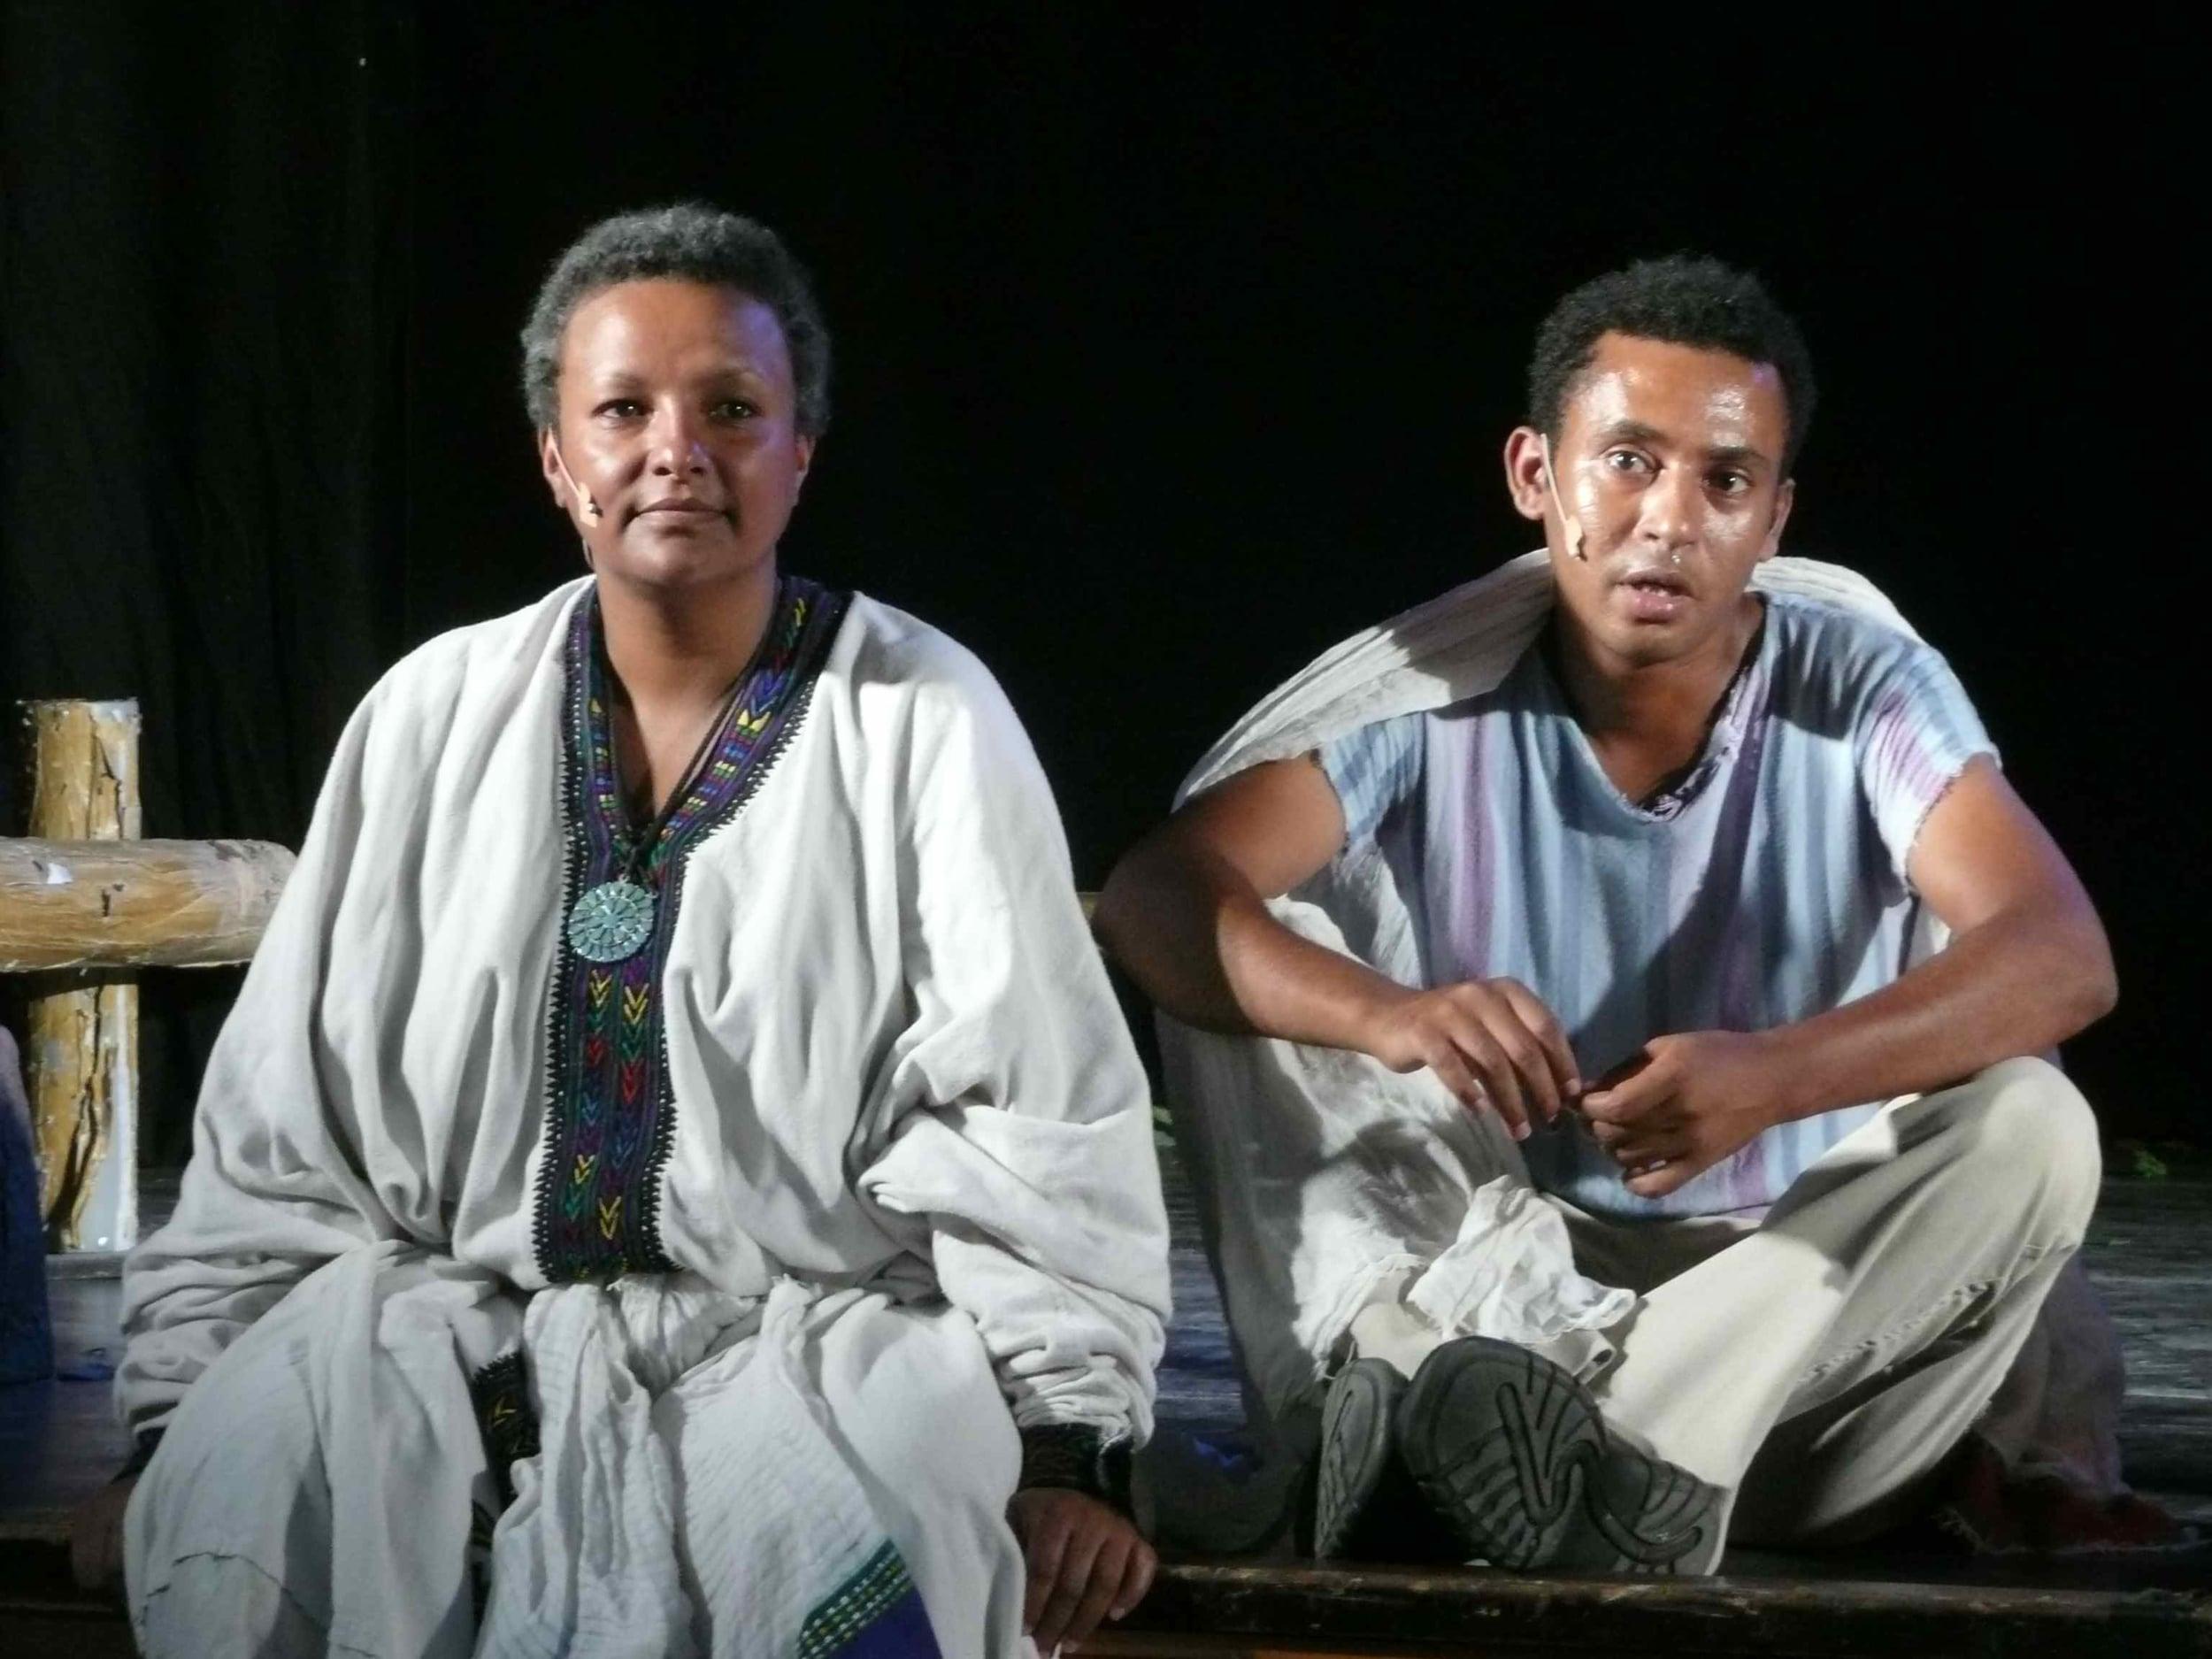 ethiopian-presnters-in-discussion_8456595004_o.jpg